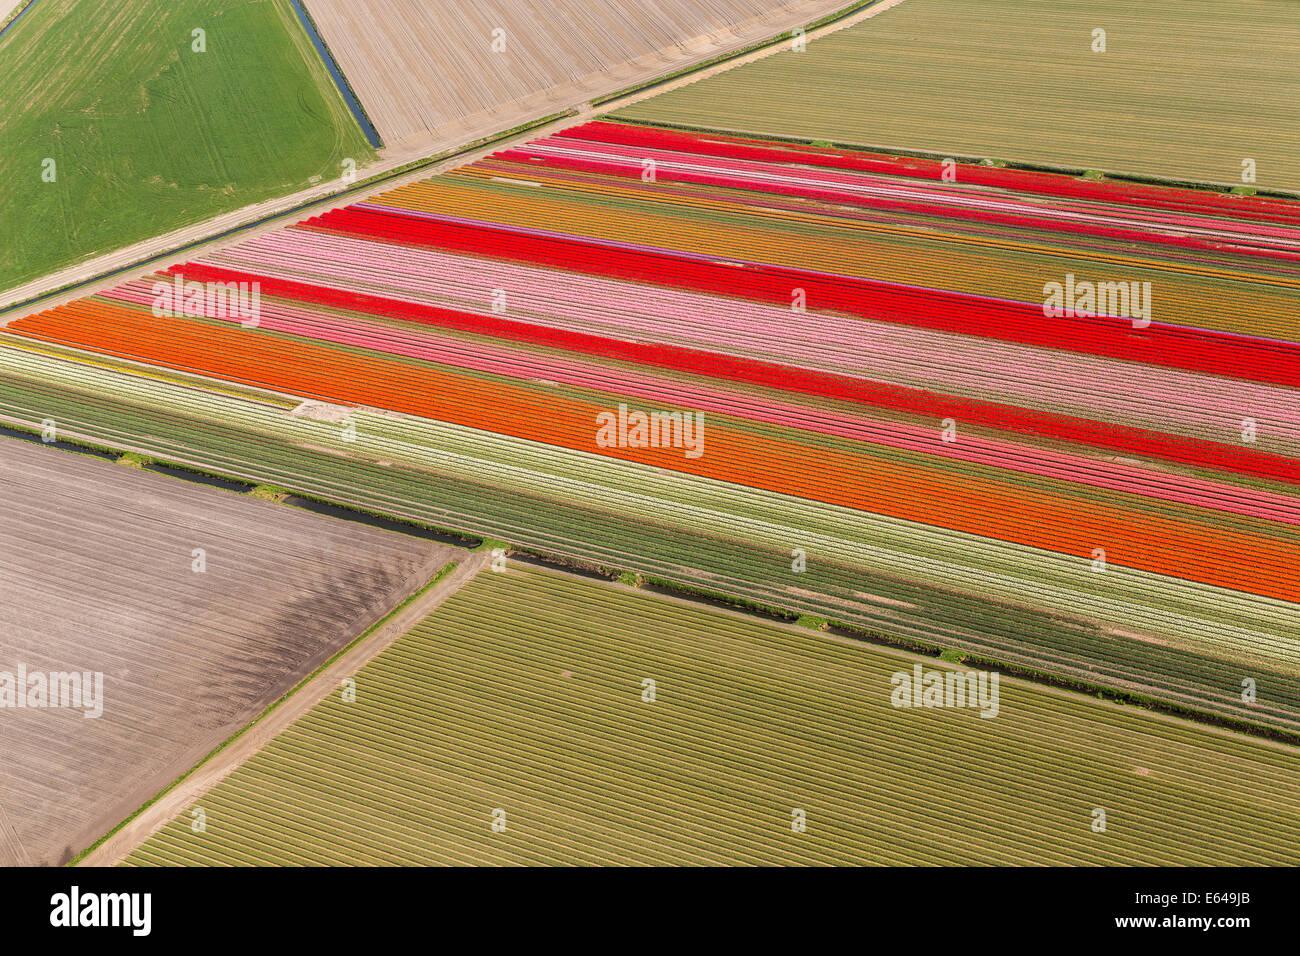 Tulip fields, North Holland, Netherlands - Stock Image